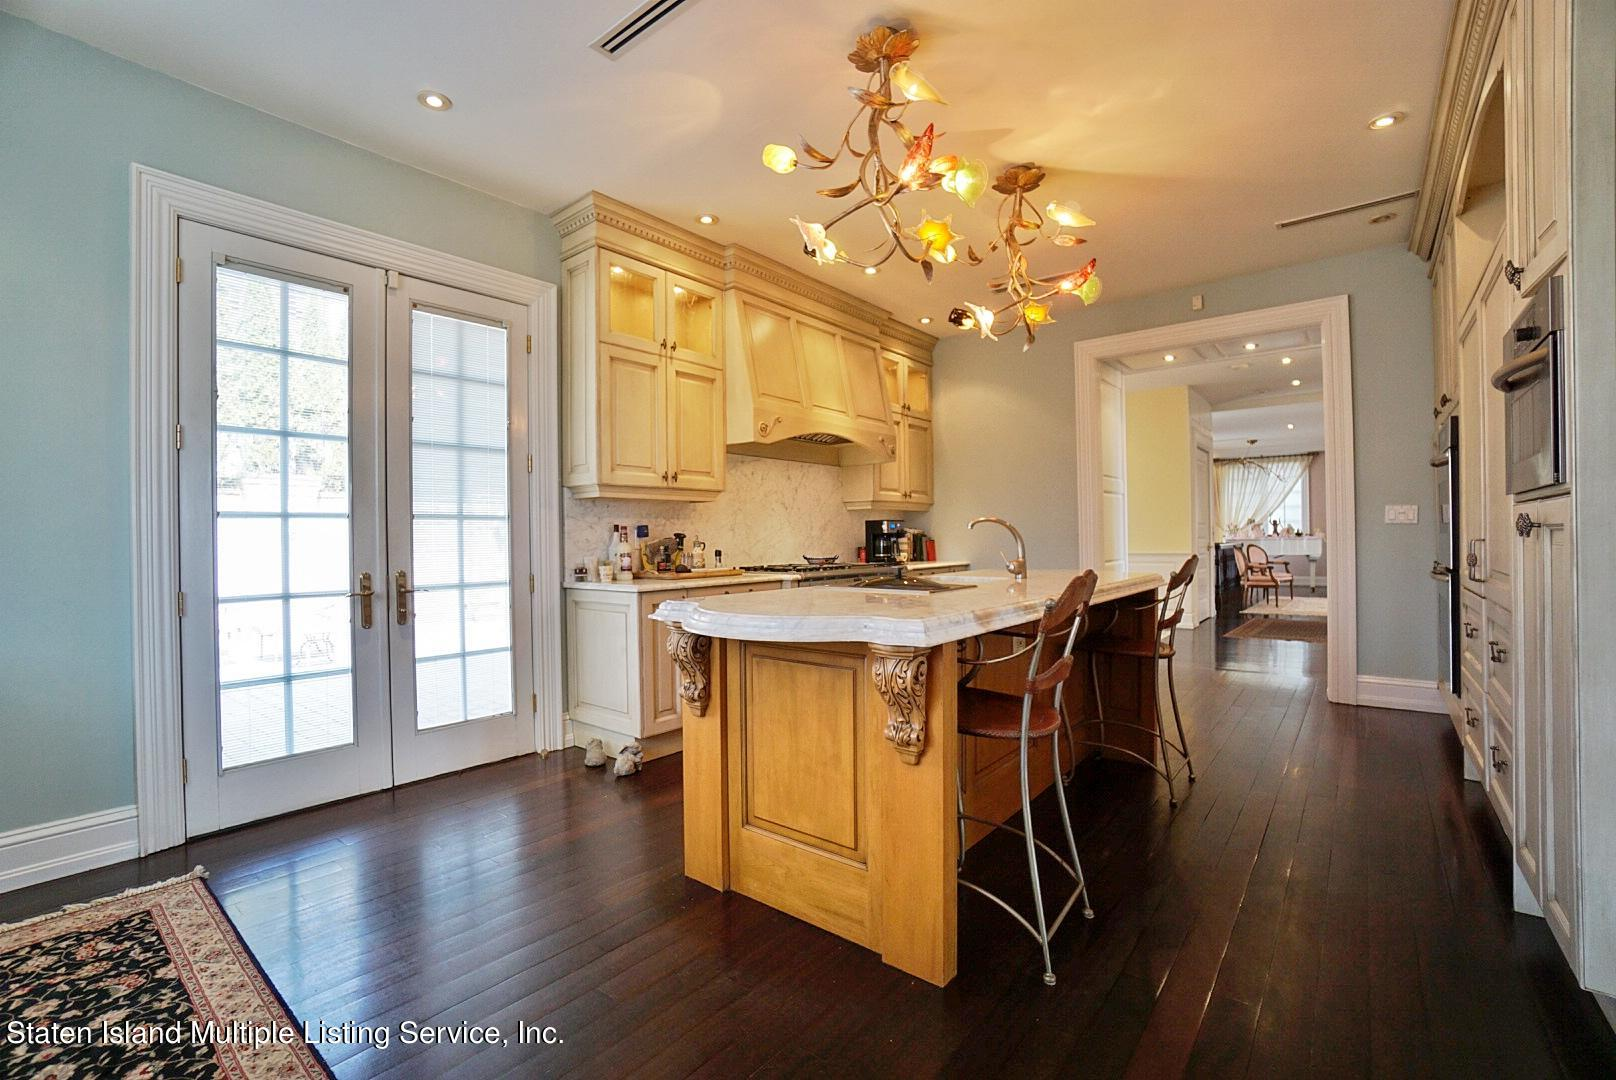 Single Family - Detached 129 Coverly Avenue   Staten Island, NY 10301, MLS-1144490-27